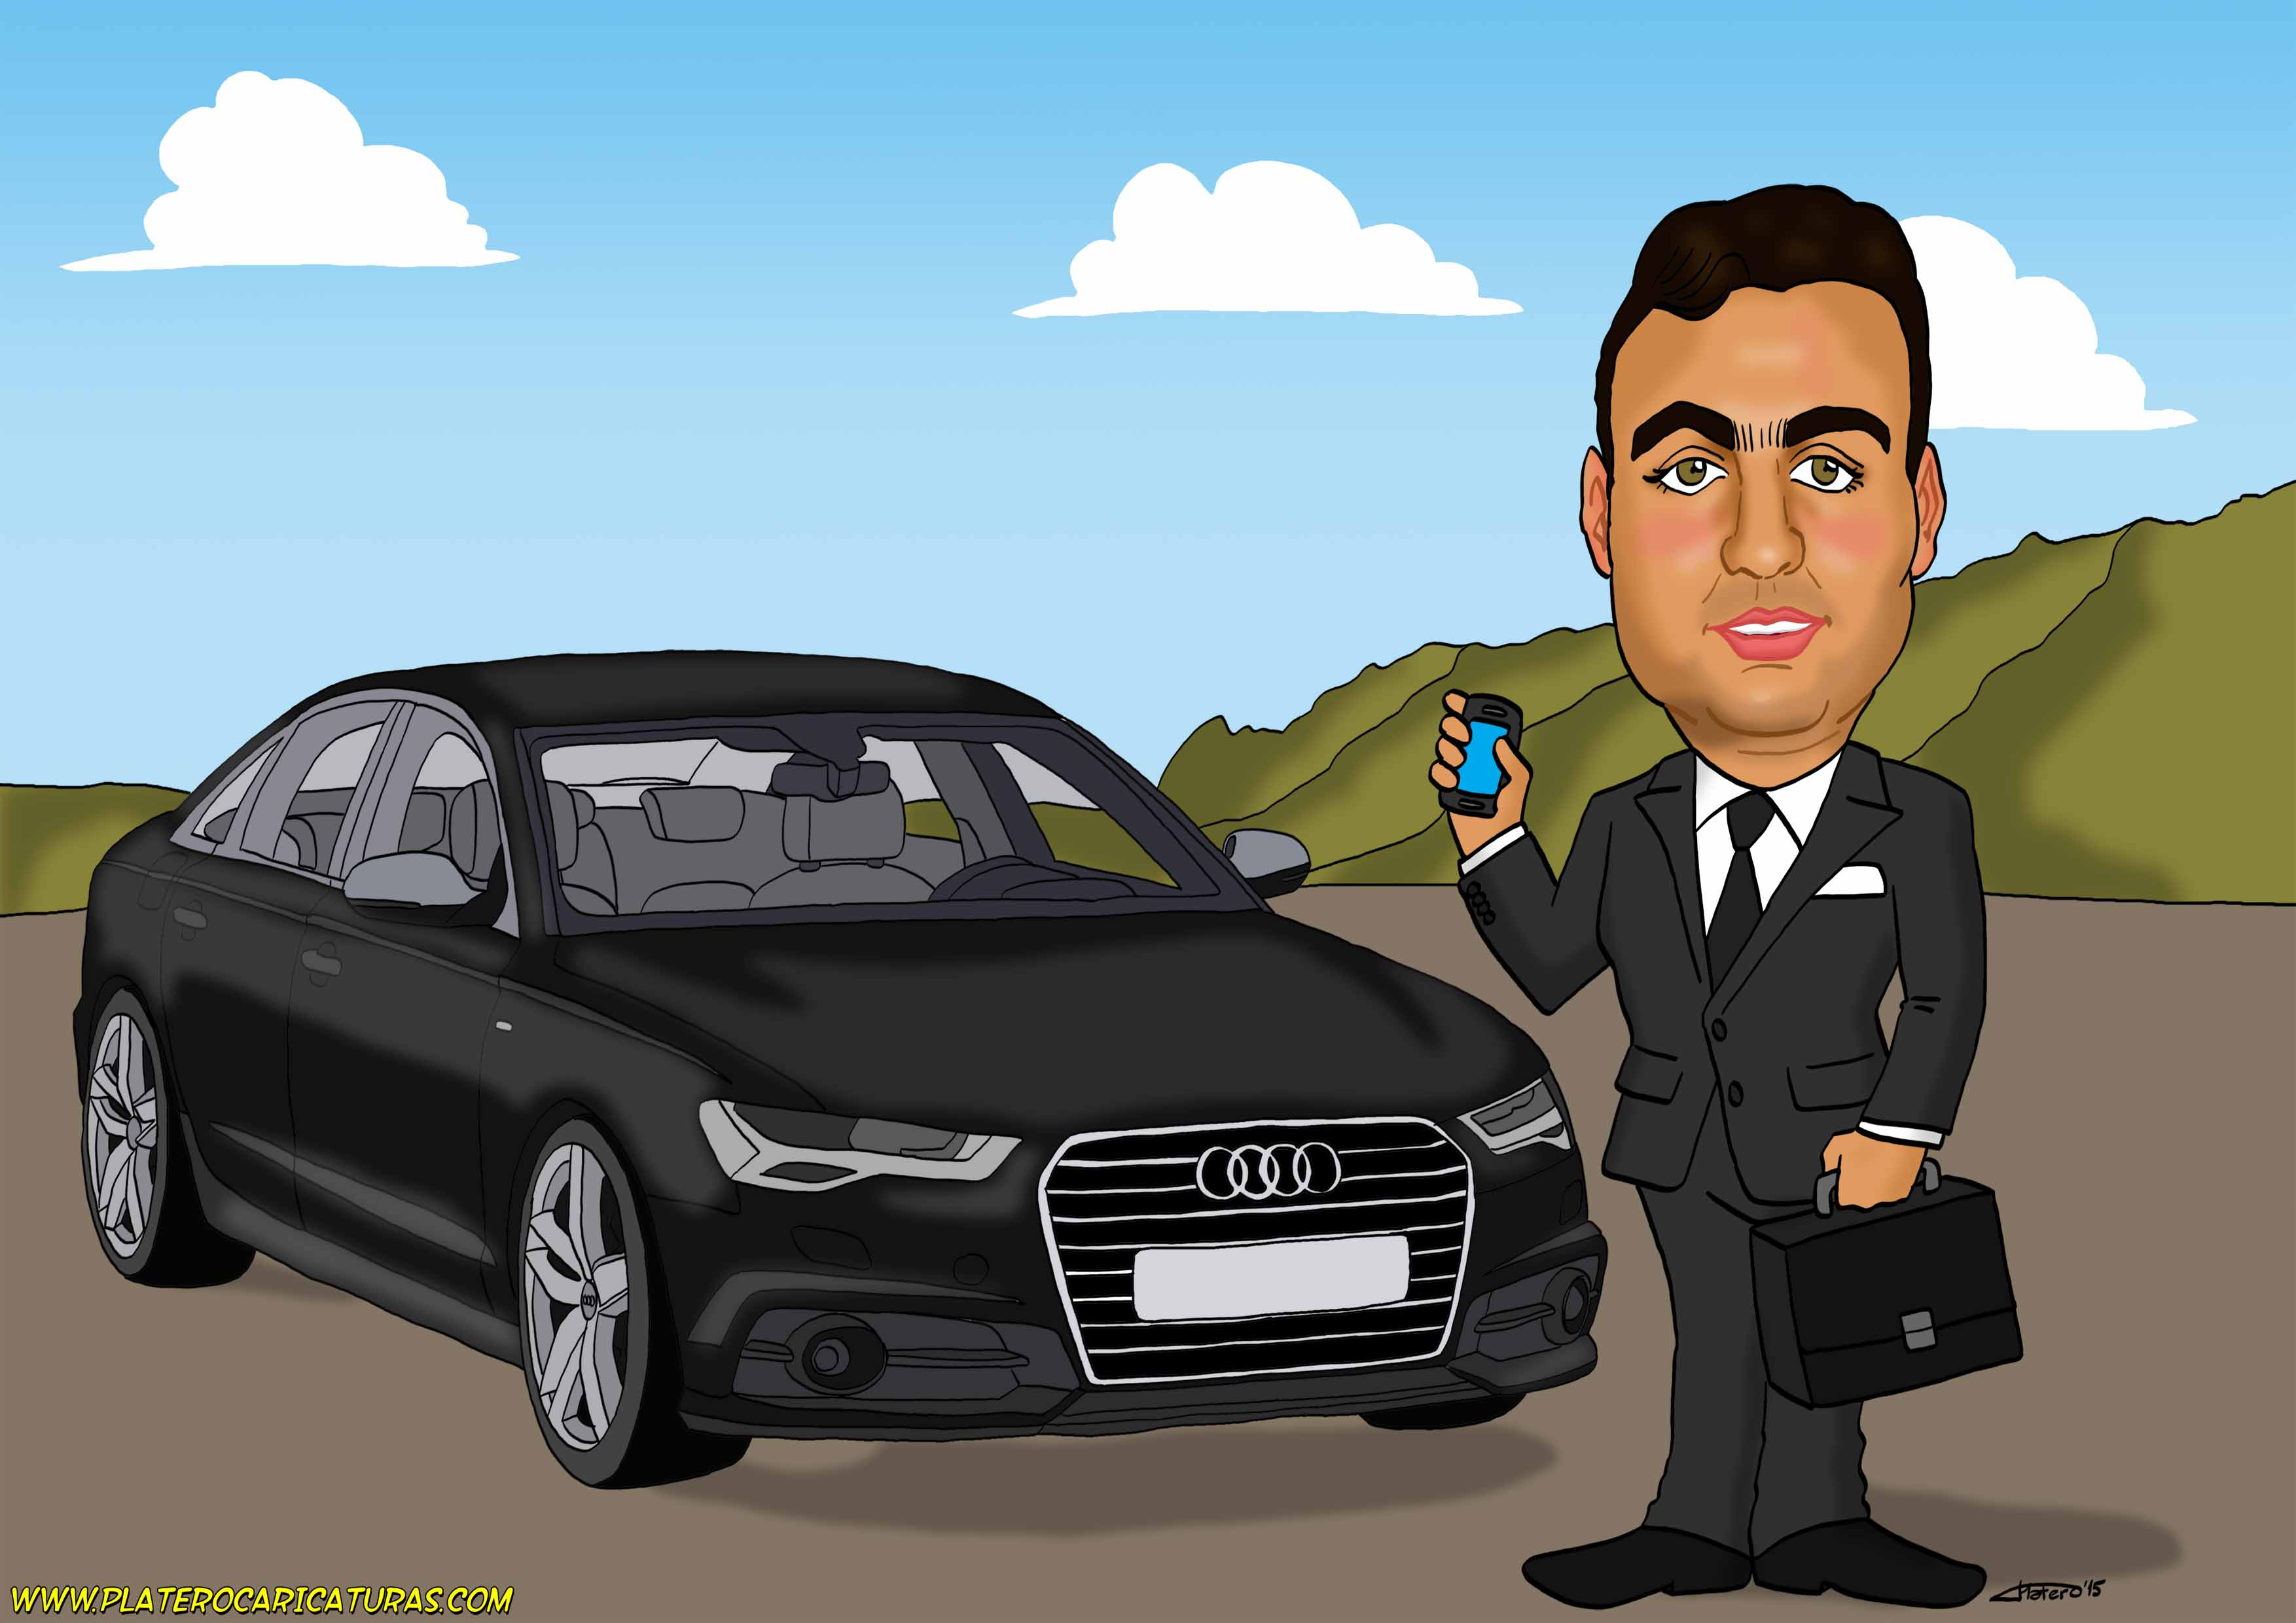 caricatura_a_color_por_encargo_personalizada_chico_con_Audi_A6_elmundodeplatero_